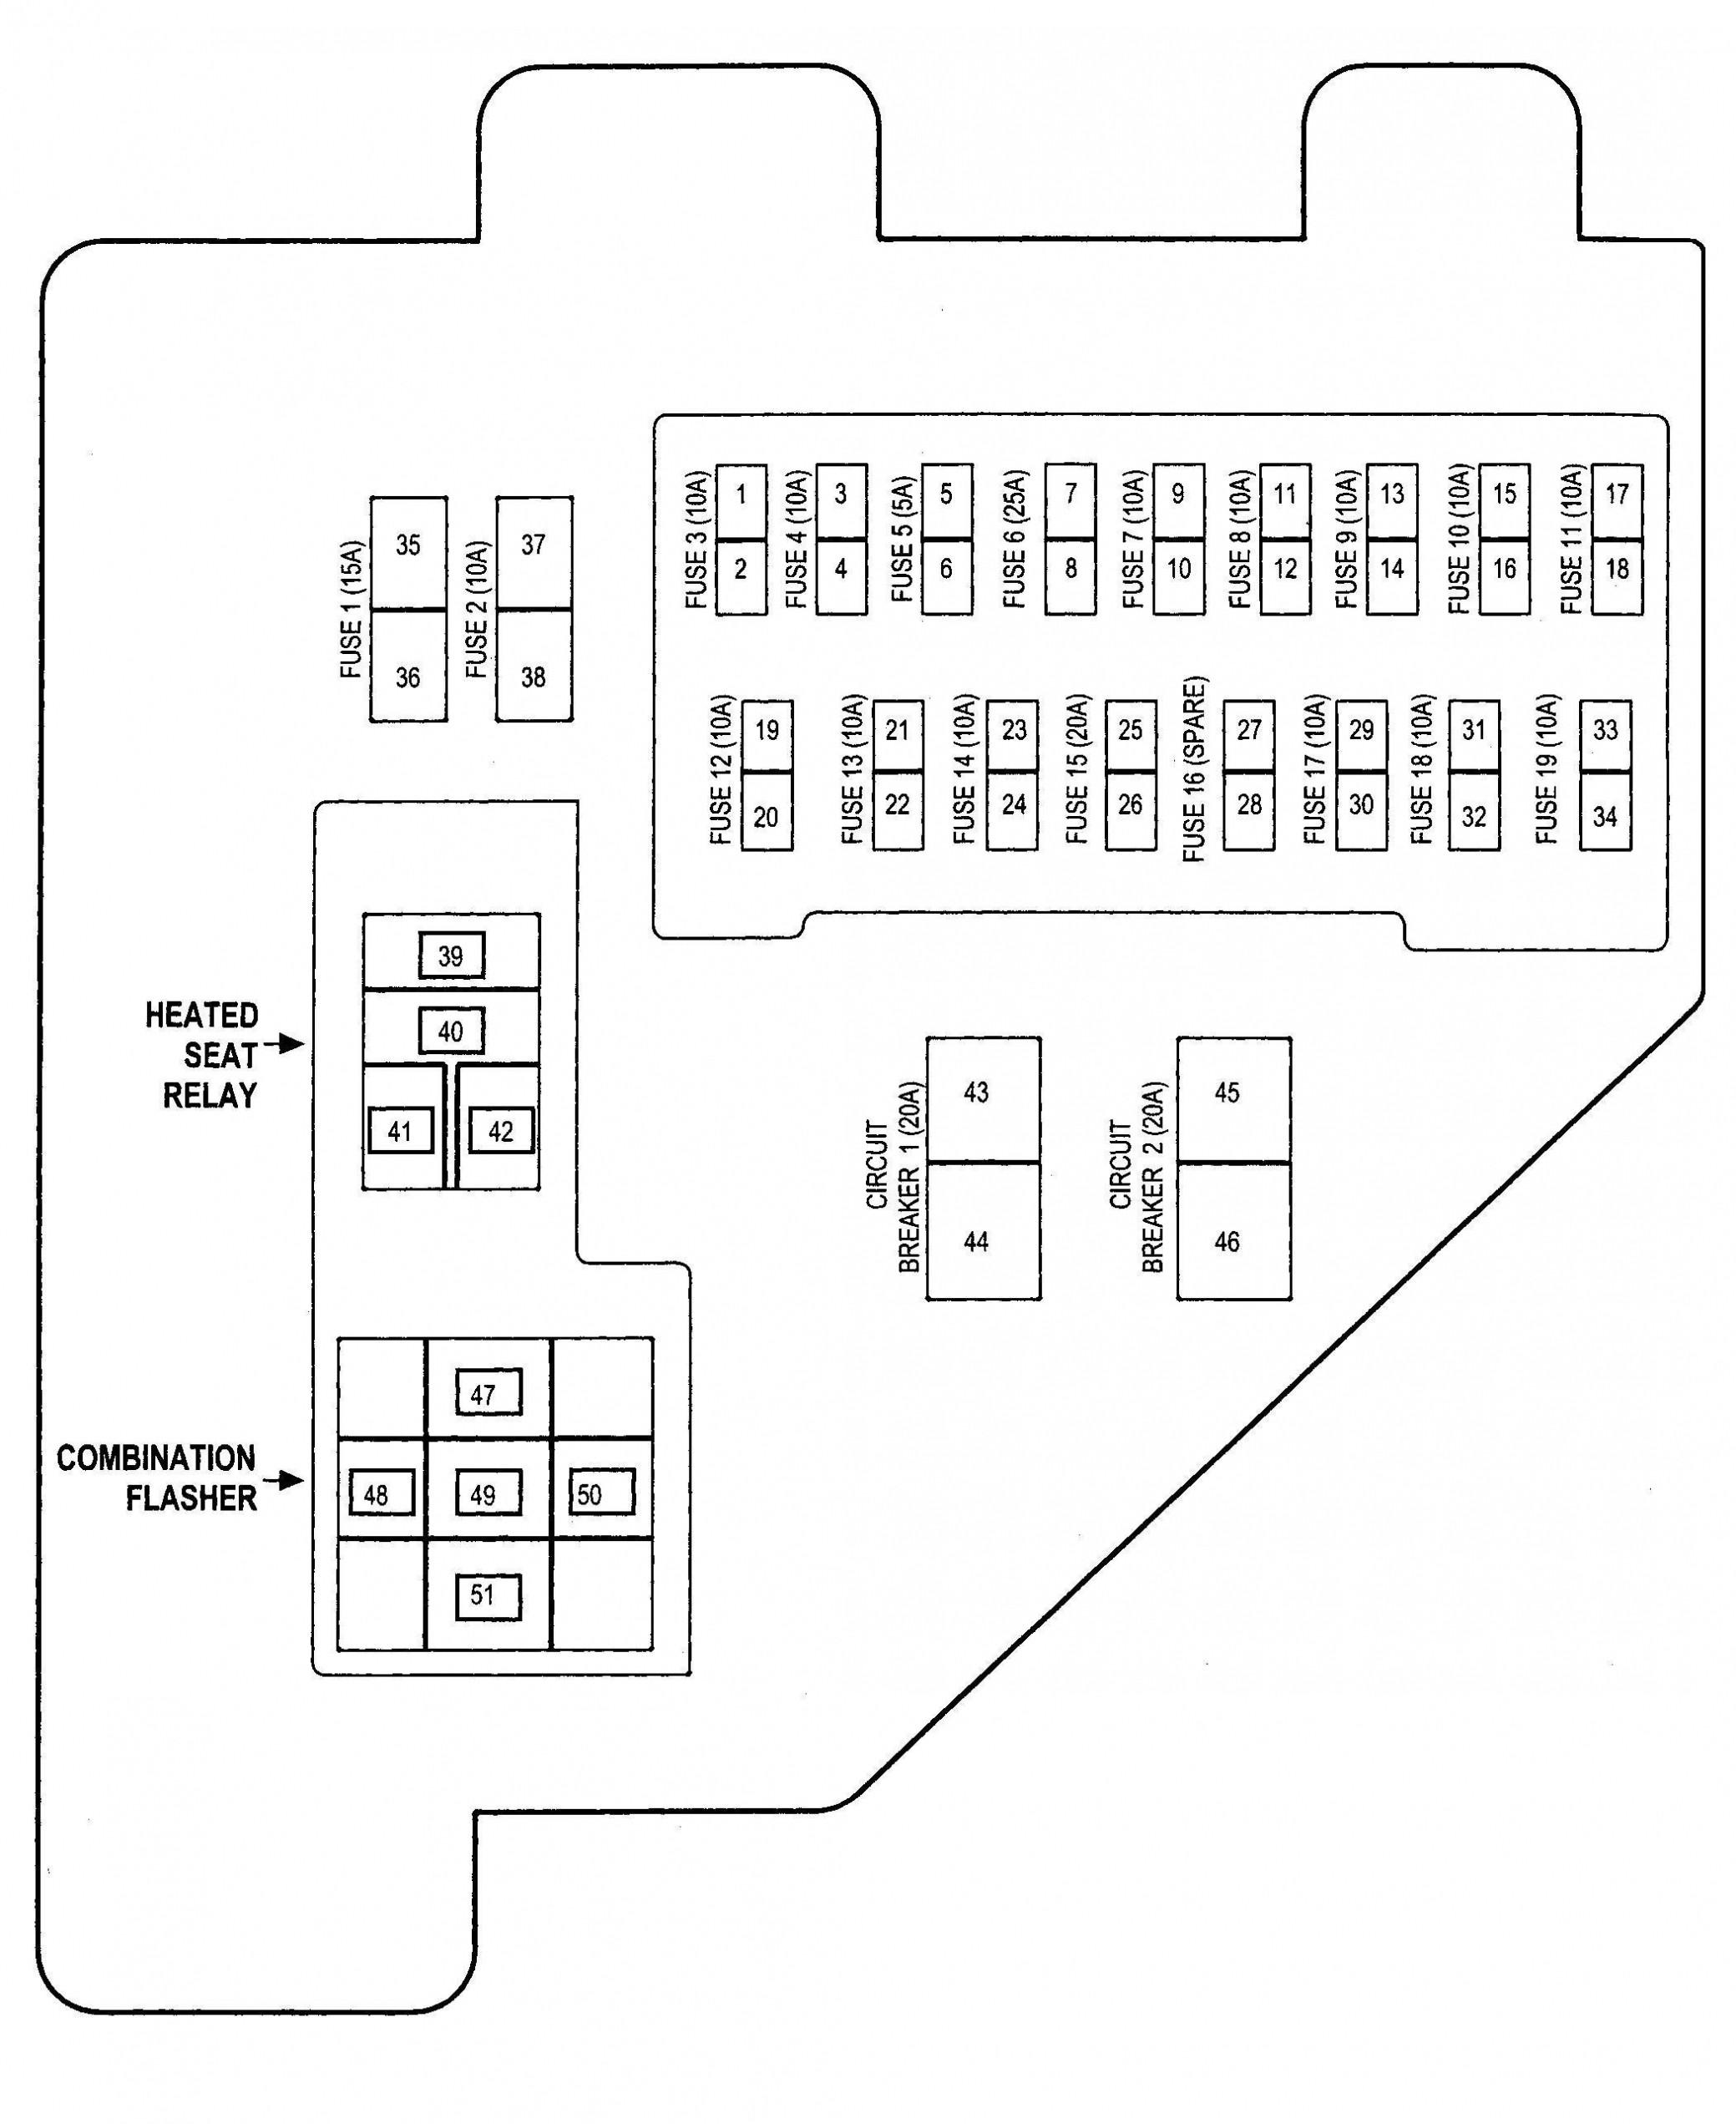 99 dodge ram fuse diagram -electrical wiring diagrams honda 90 | begeboy  wiring diagram source  begeboy wiring diagram source